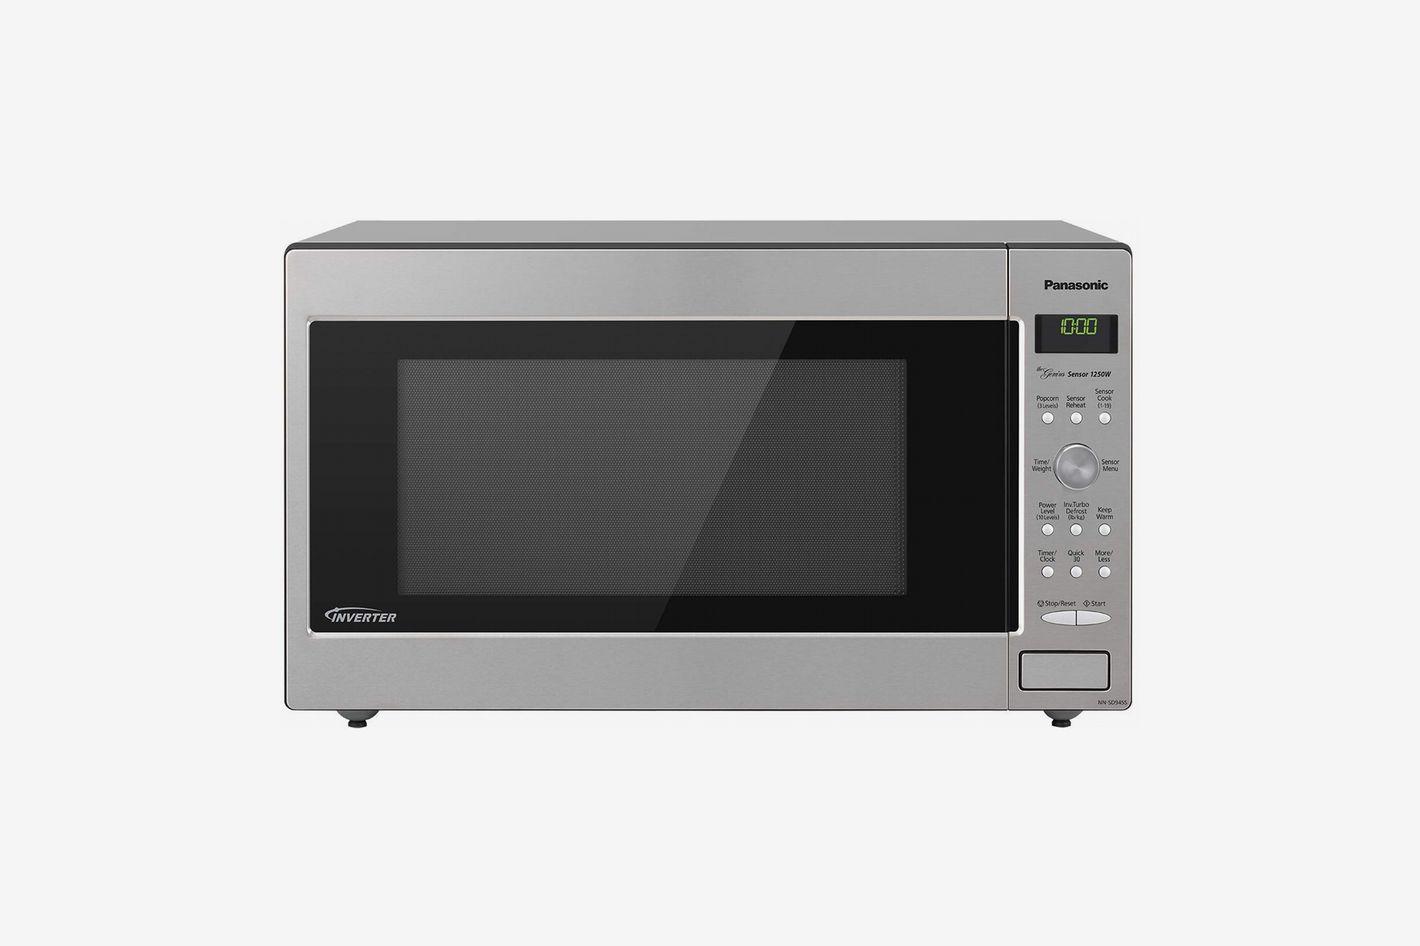 Best Stainless Steel Microwave Panasonic Oven Nn Sd945s